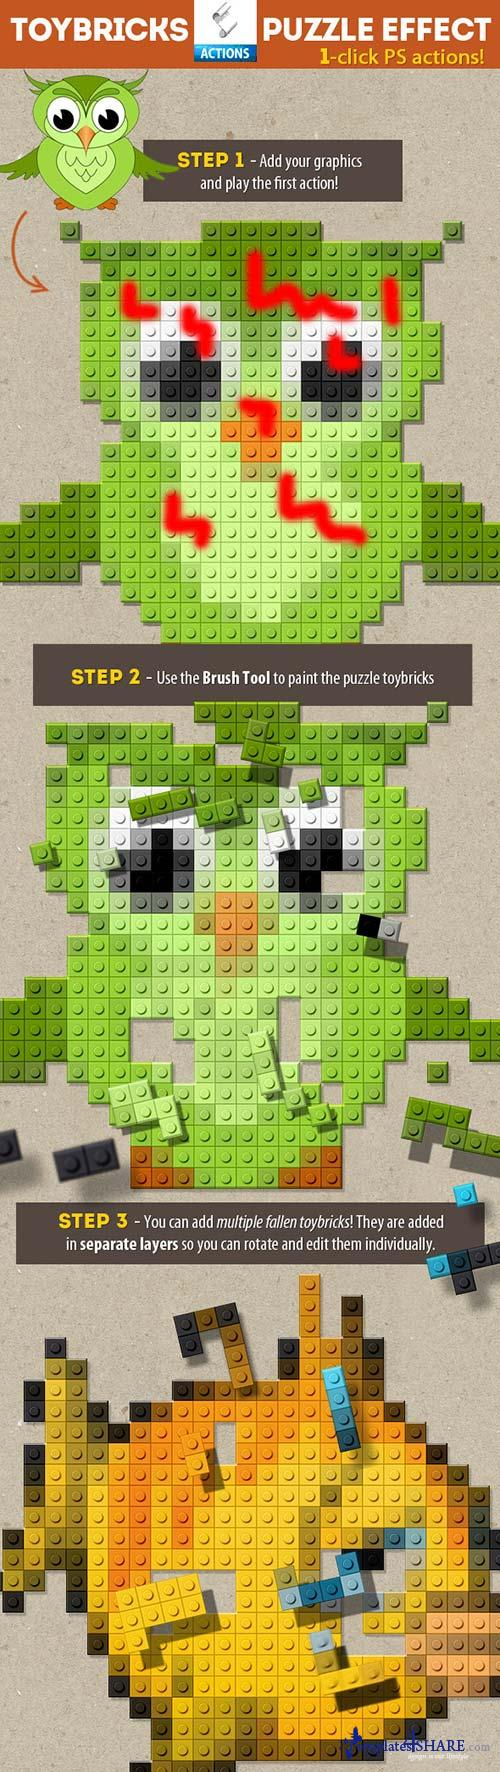 GraphicRiver Lego Toy Bricks Puzzle Photoshop Actions